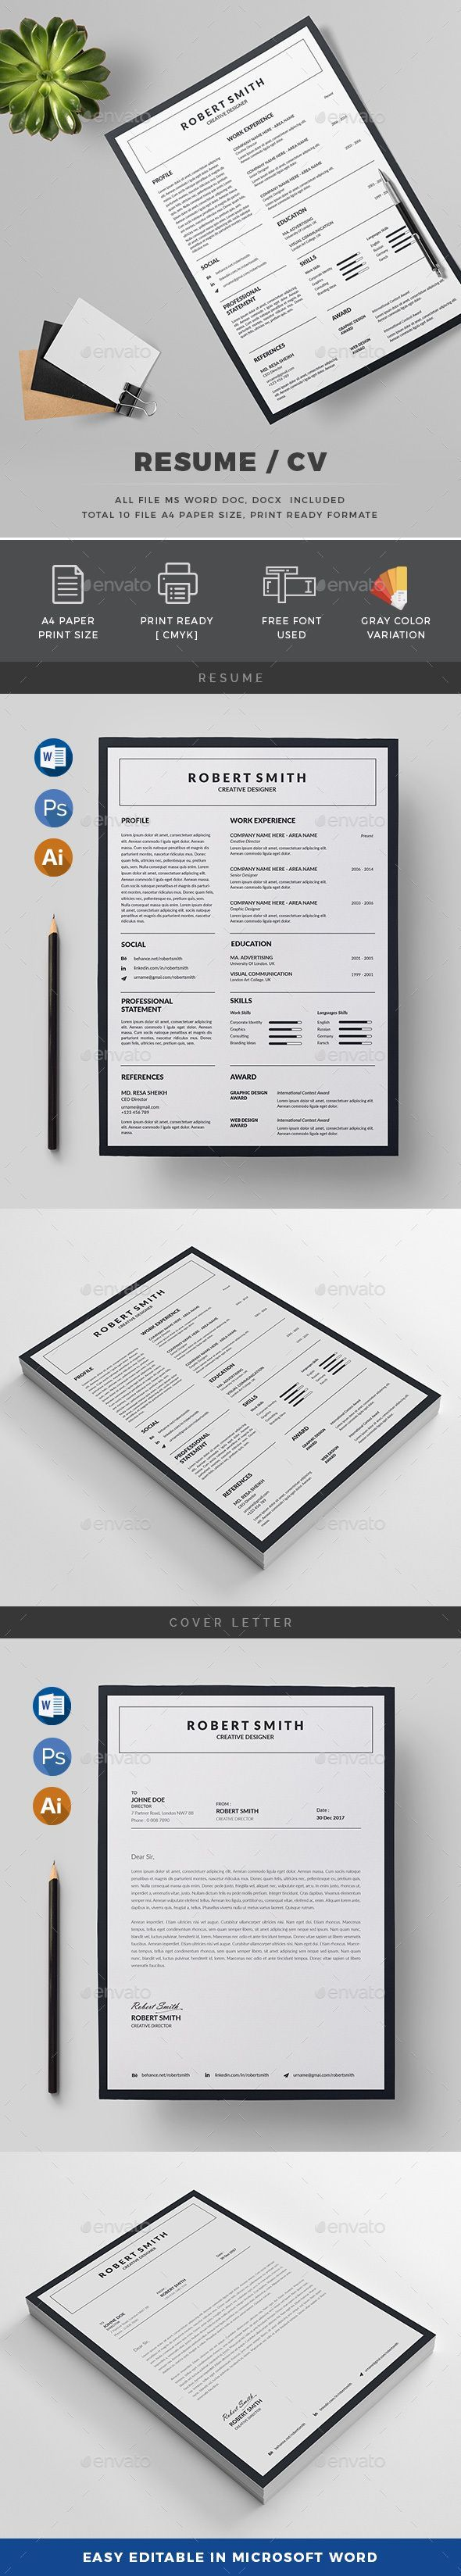 Classic Resume Template [120360] Resume templates